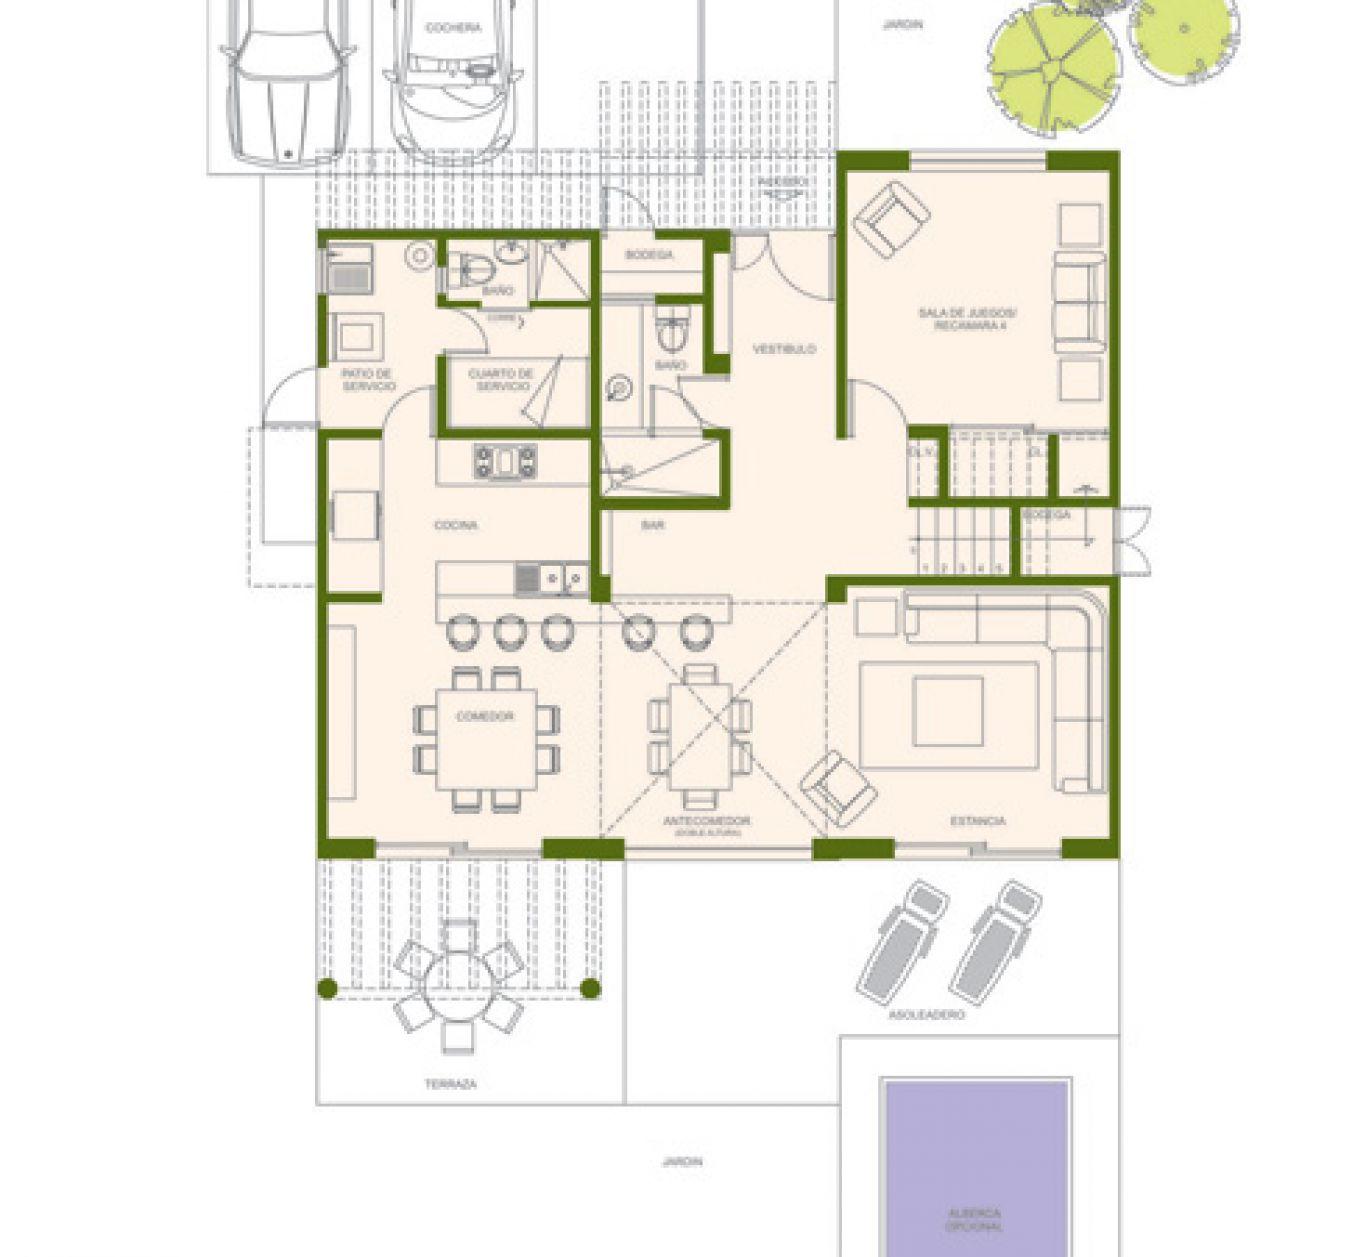 Residencial paraíso country club, id 1525184, no 1, plano de albatross, 403